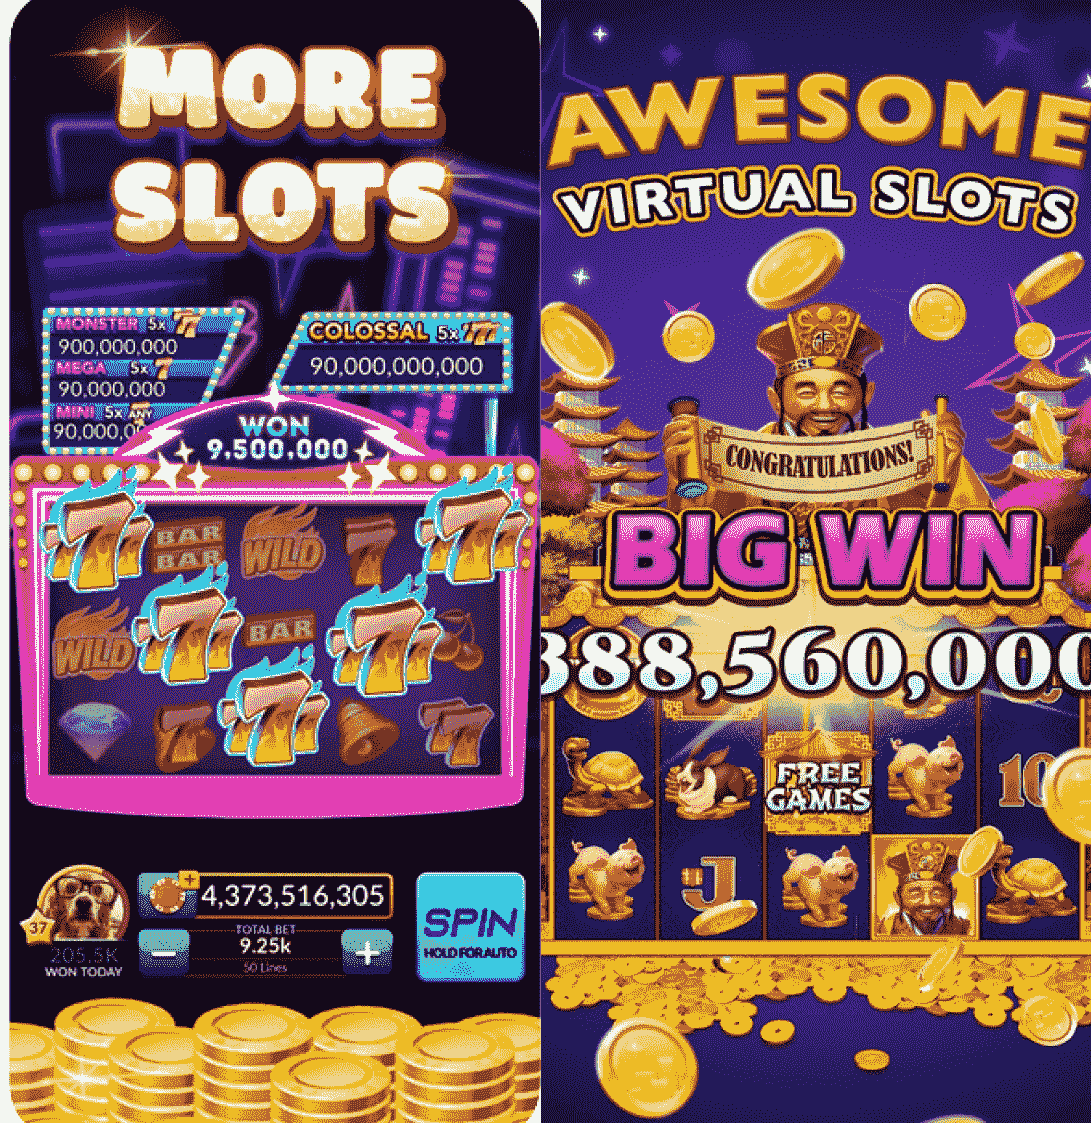 Jackpot Magic Slots image